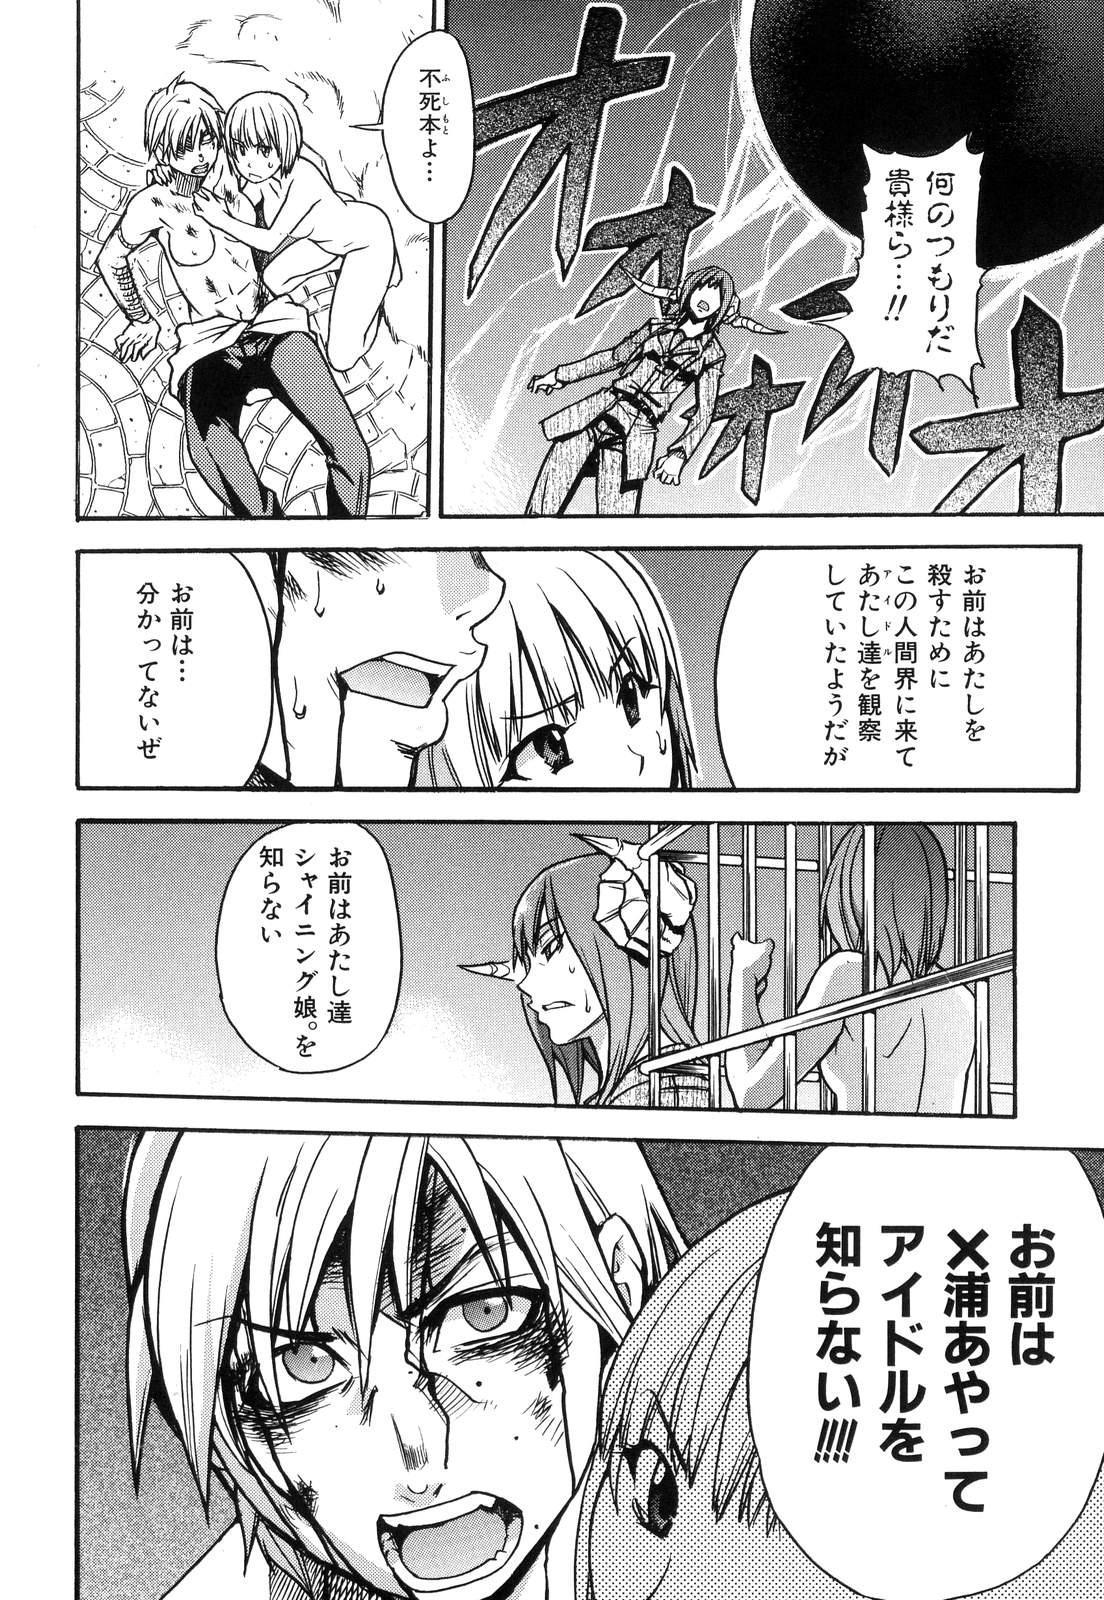 Shining Musume. 6. Rainbow Six 167